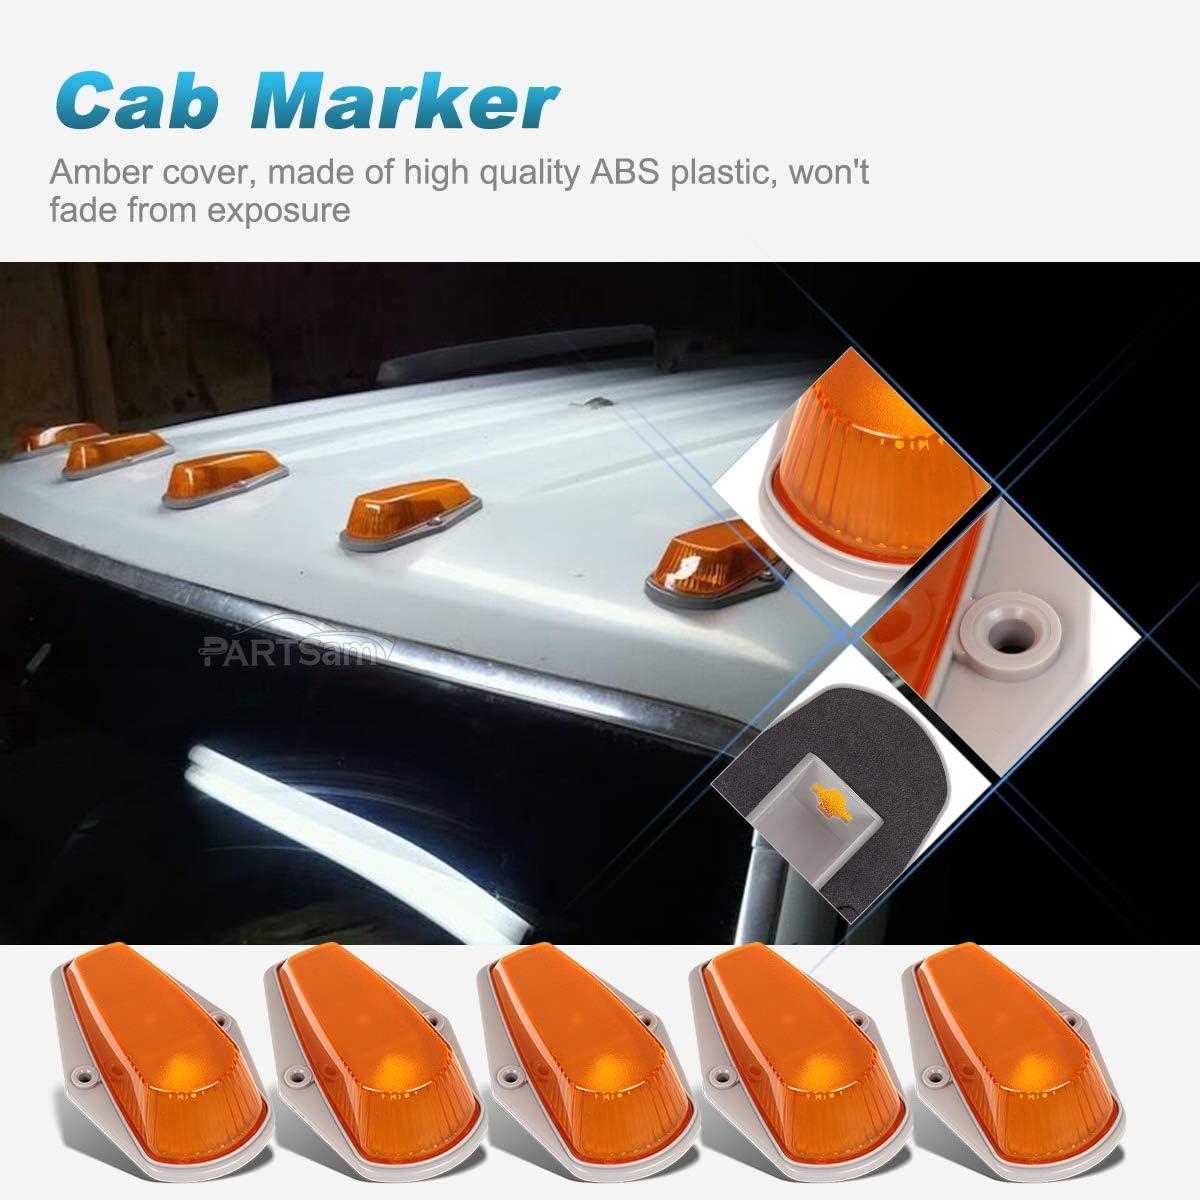 100W Halogen -Black Passenger side WITH install kit 6 inch 2011 Western Star LOWMAX Post mount spotlight